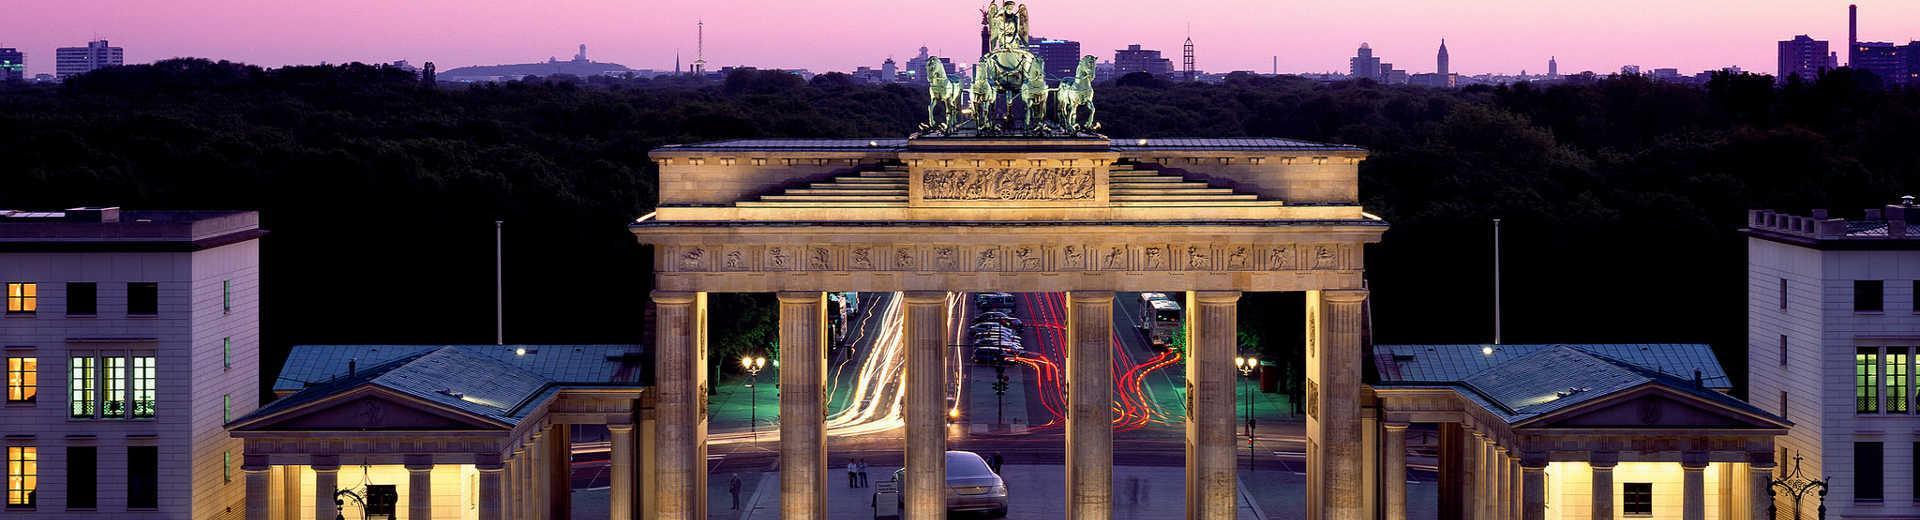 Berline feature